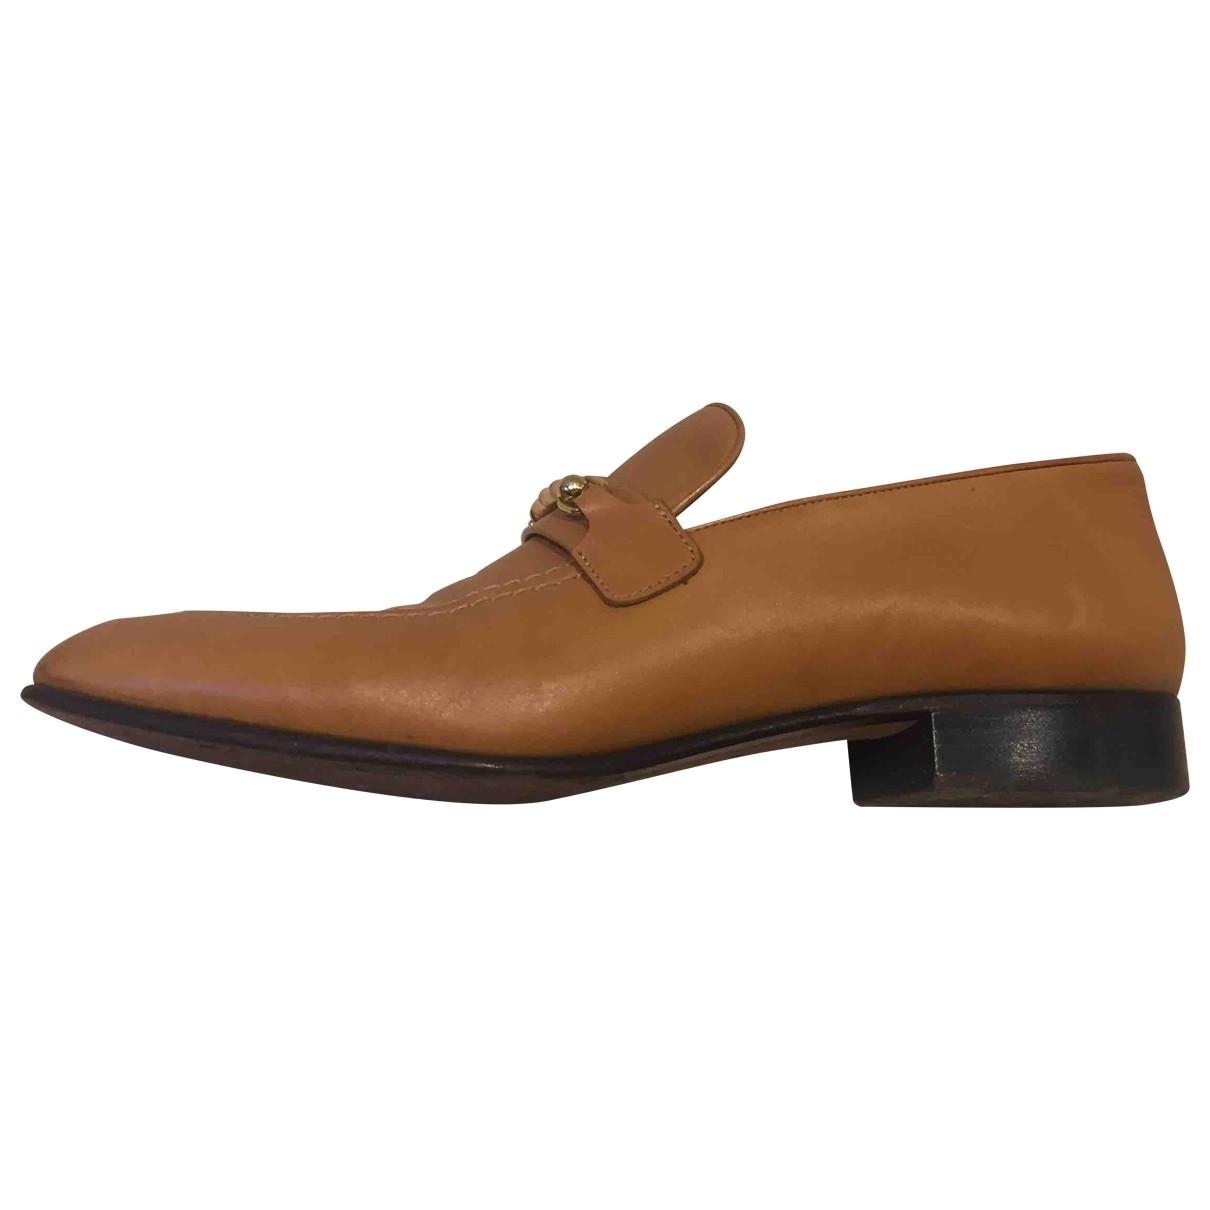 Joseph \N Camel Leather Flats for Women 41 EU